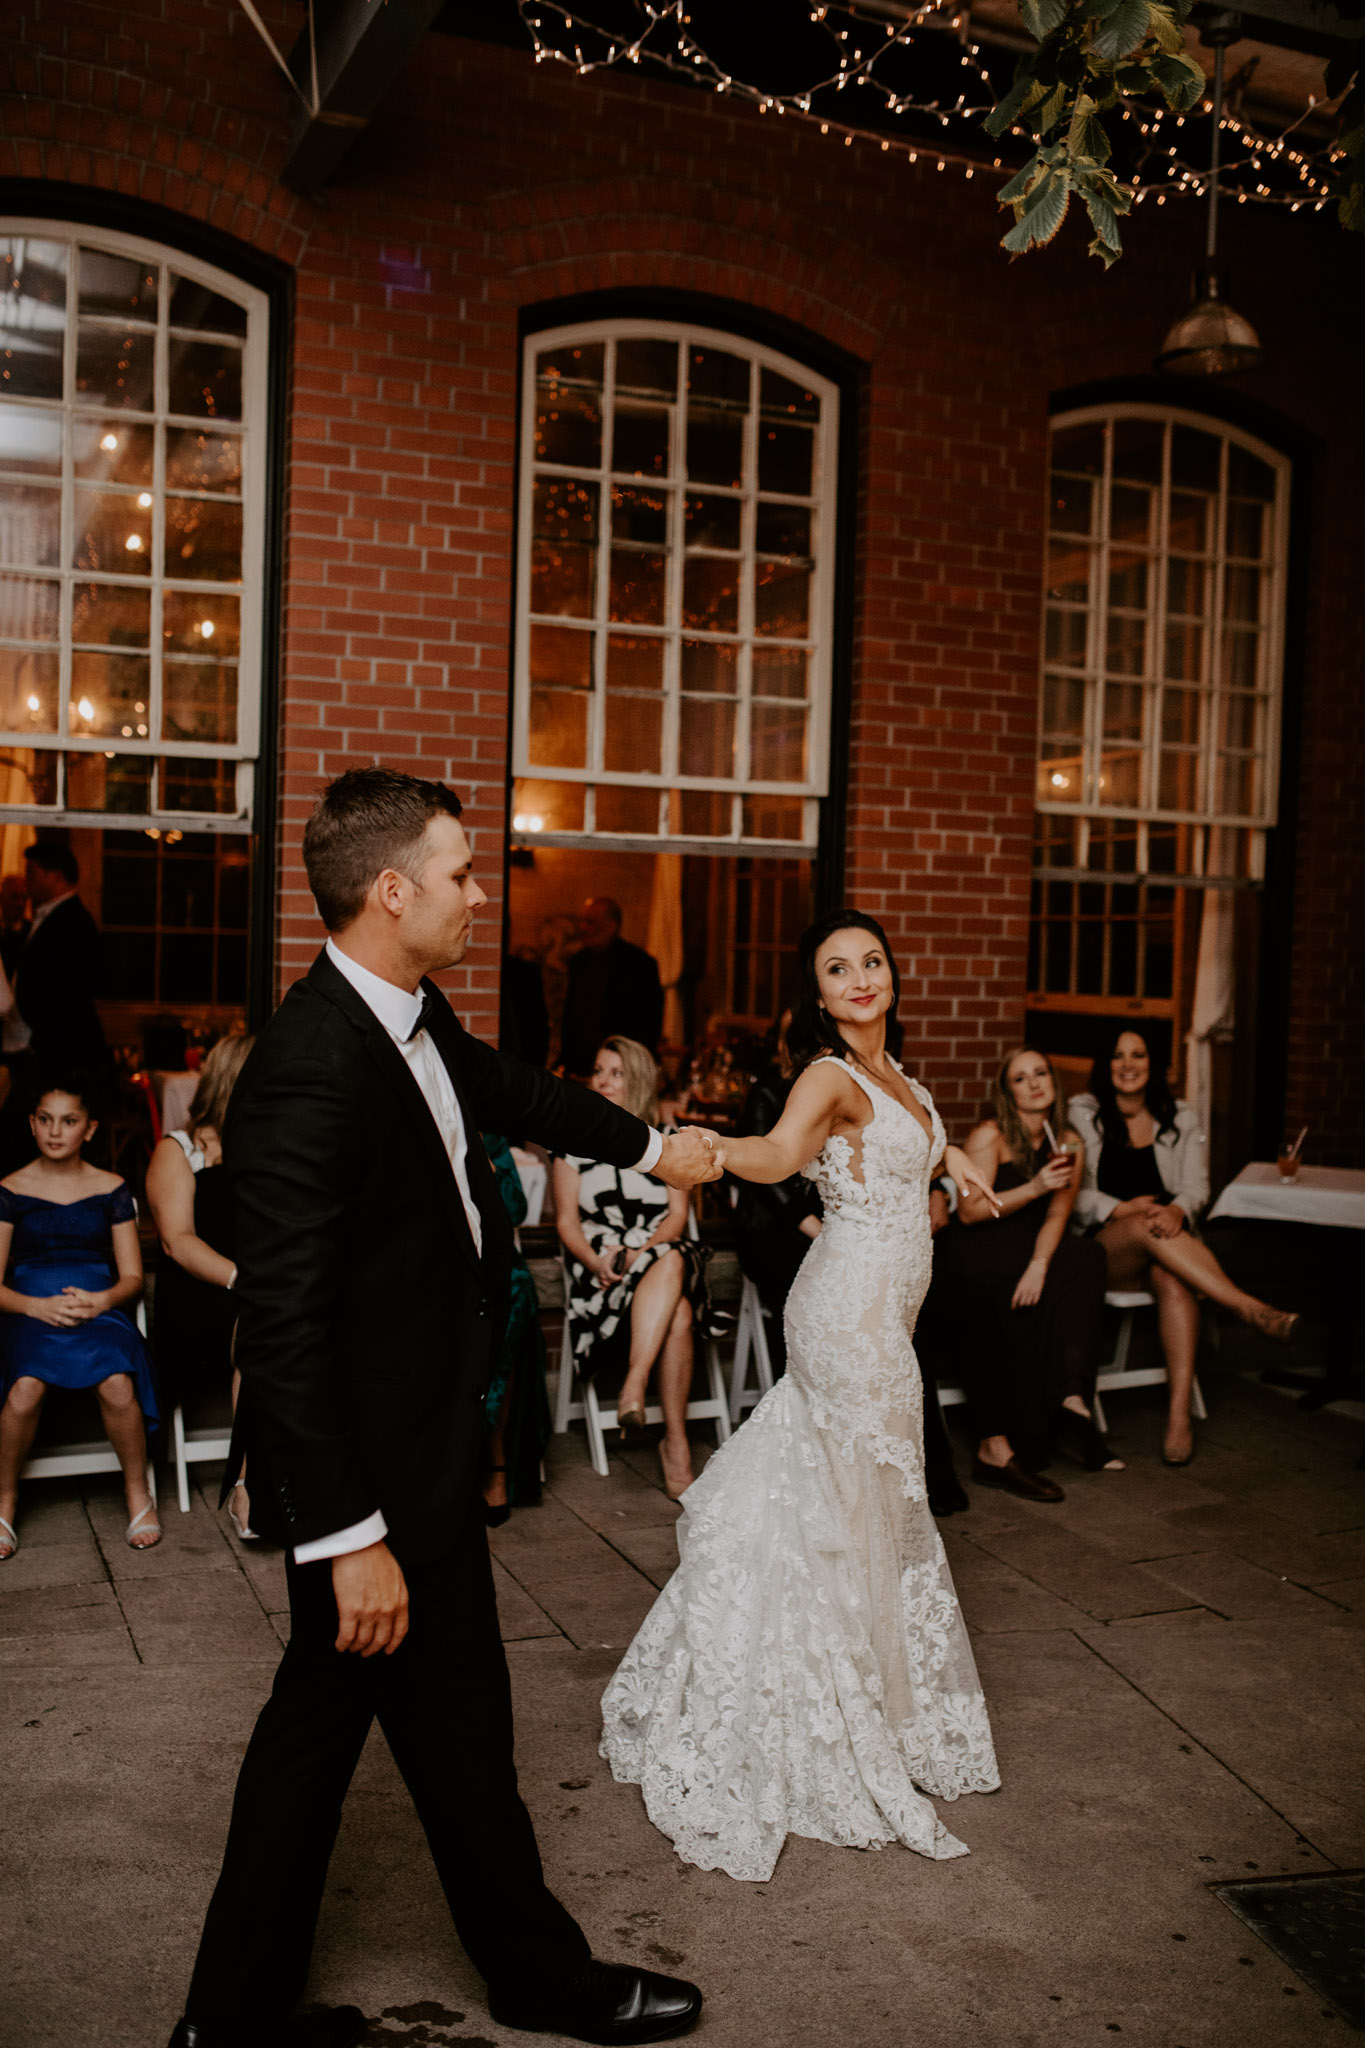 Caffino Wedding - first dance